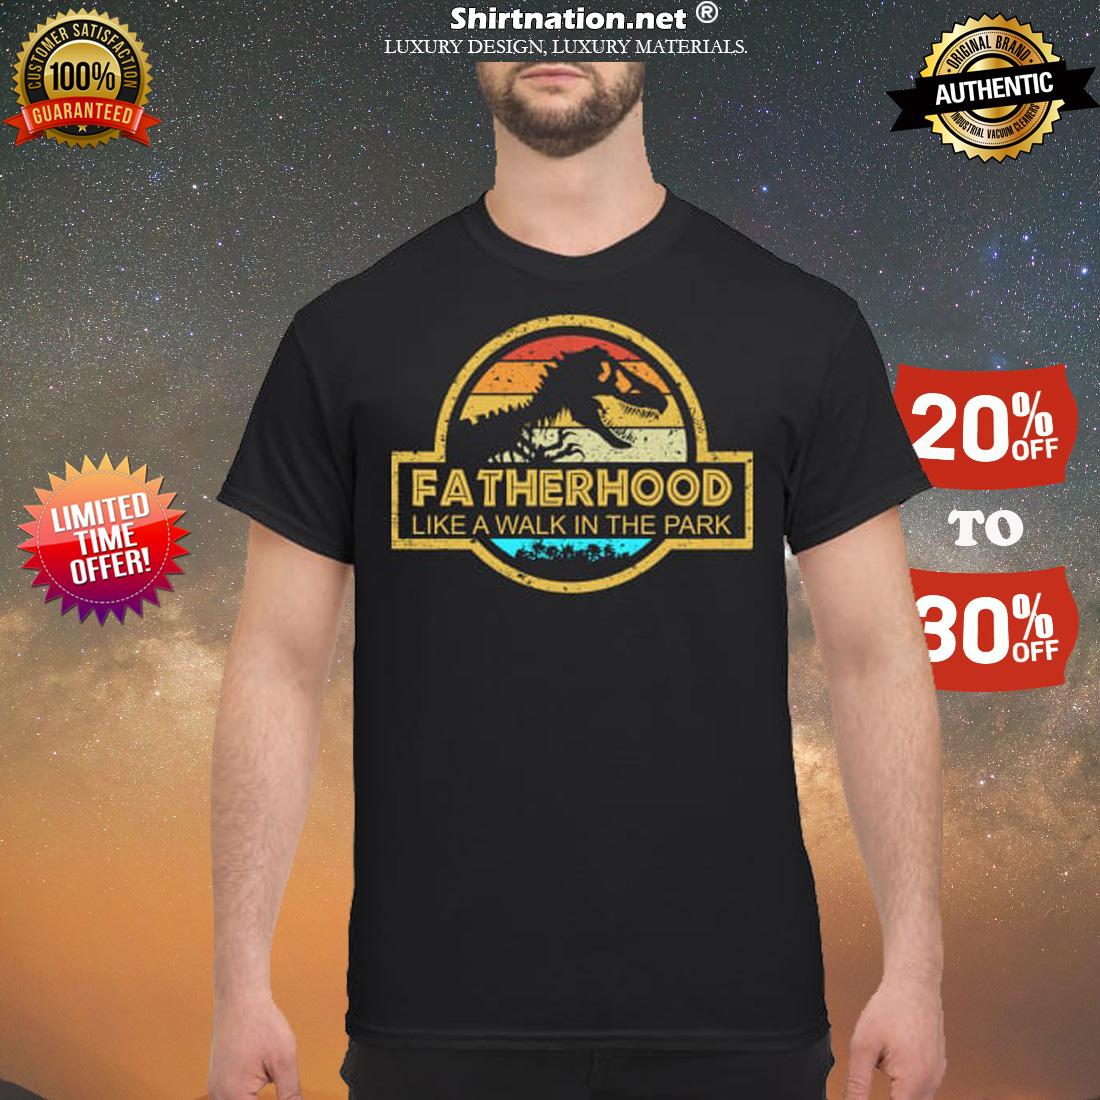 Fatherhood like a walk in the park classic shirt